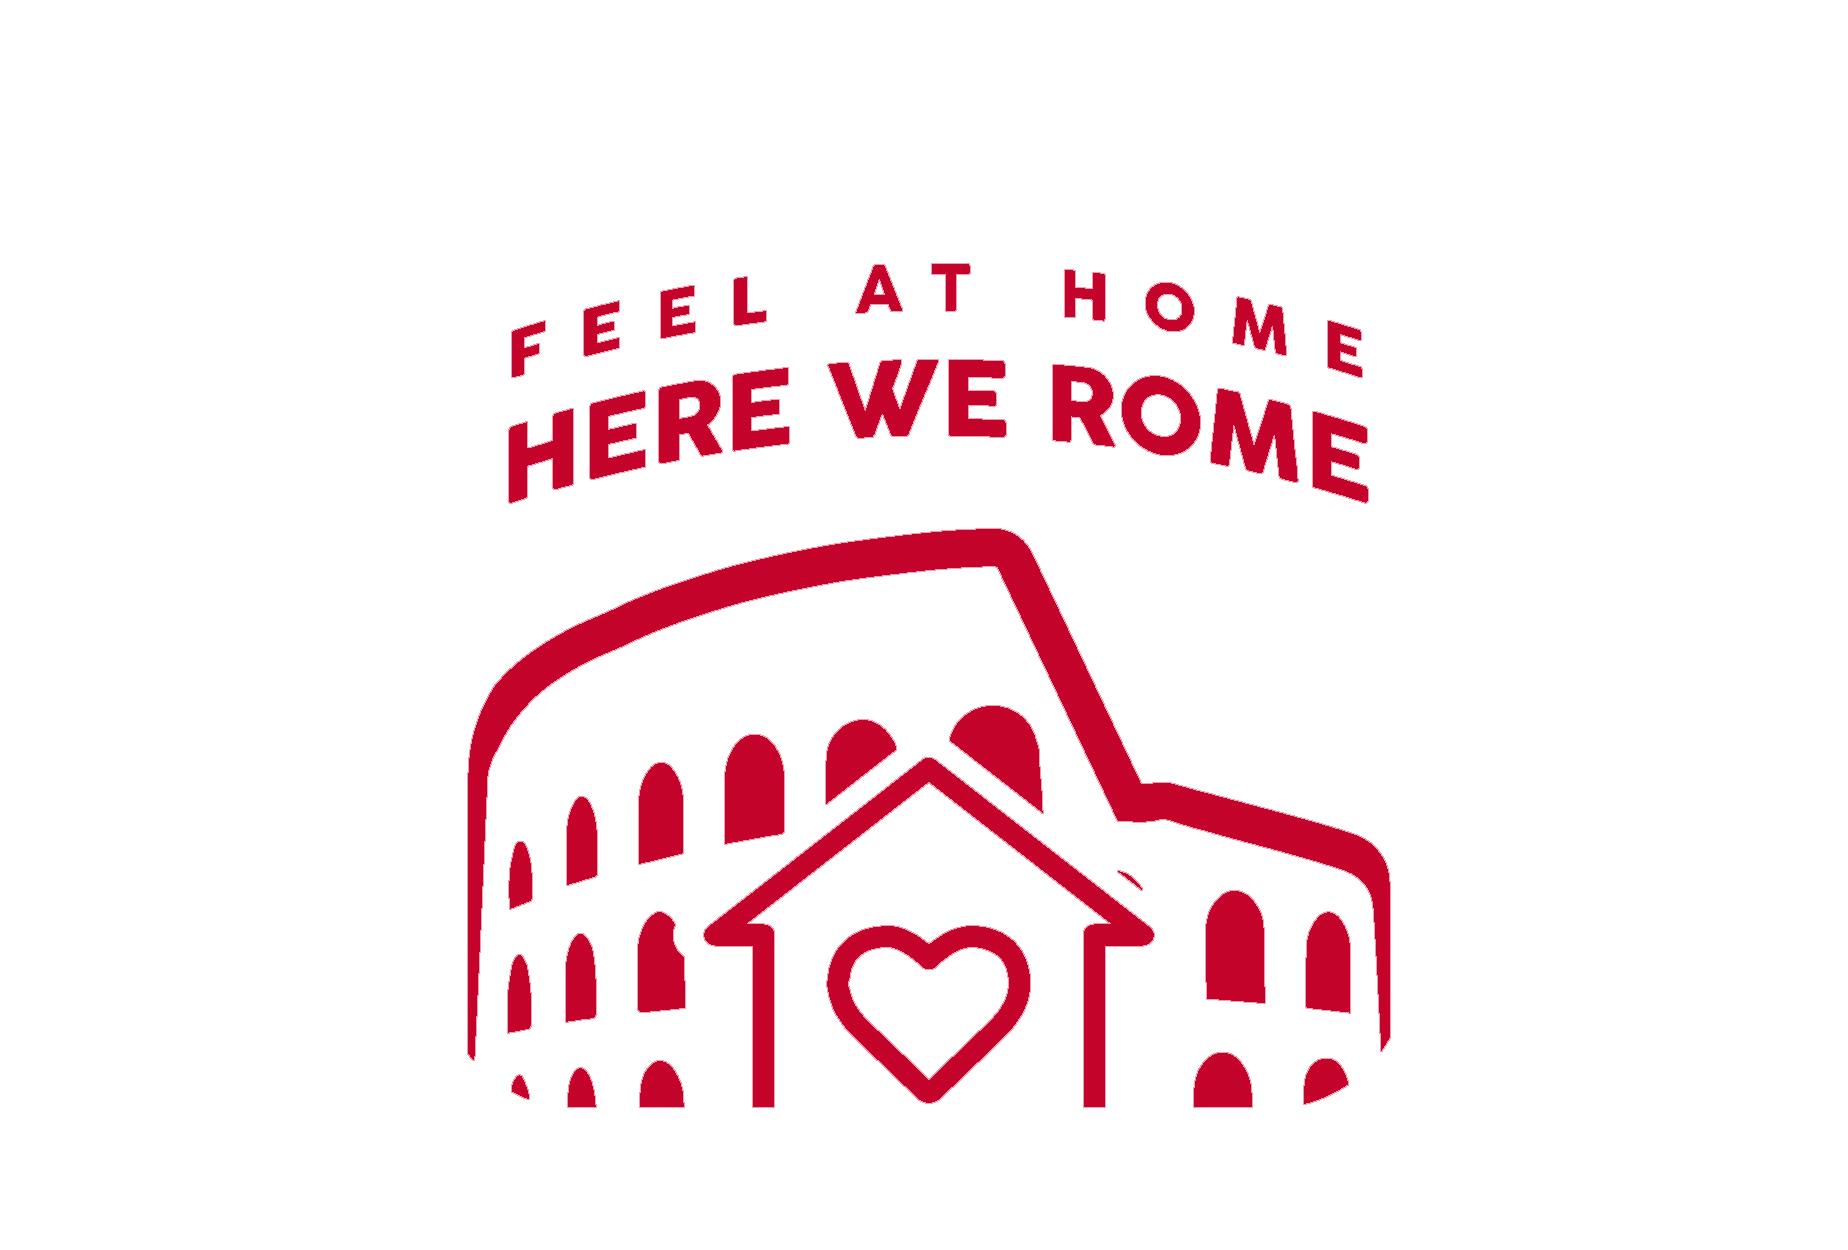 Here We Rome